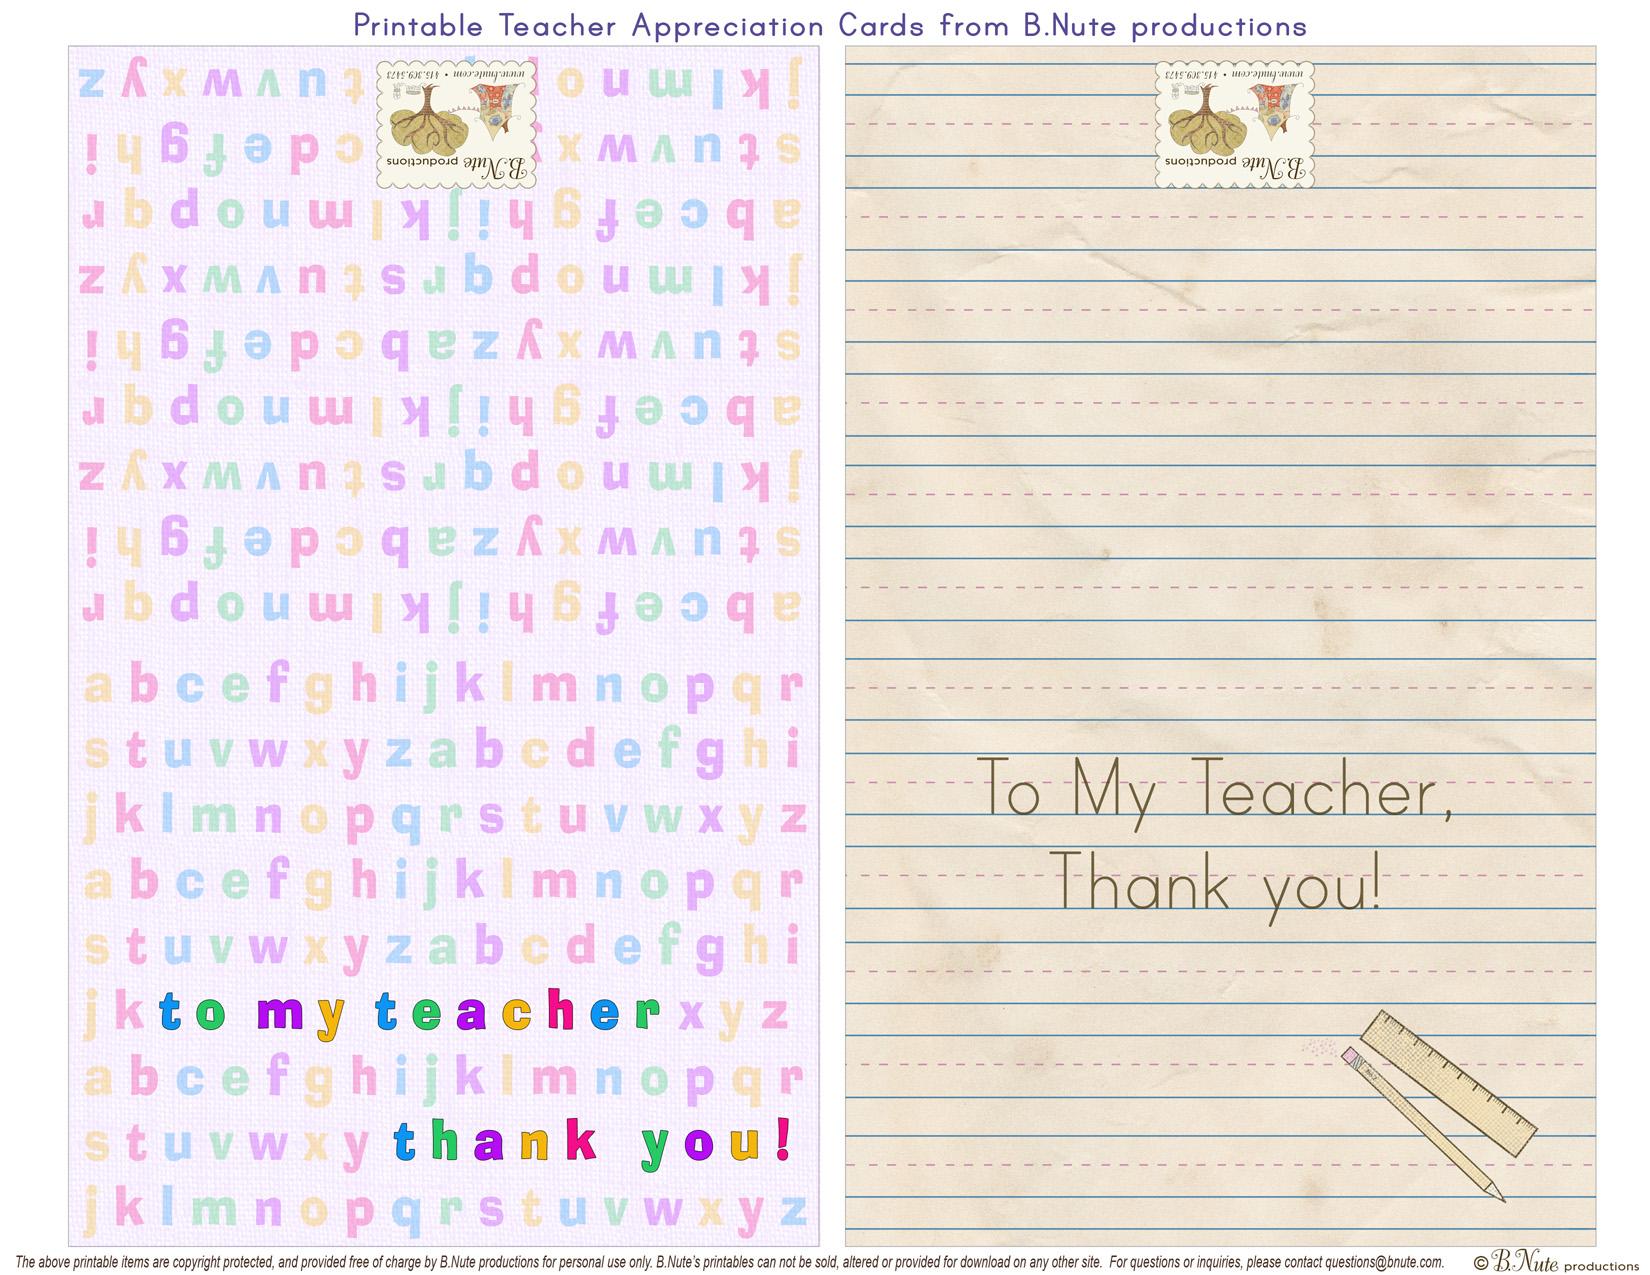 7 Images of Printable Teacher Appreciation Cards